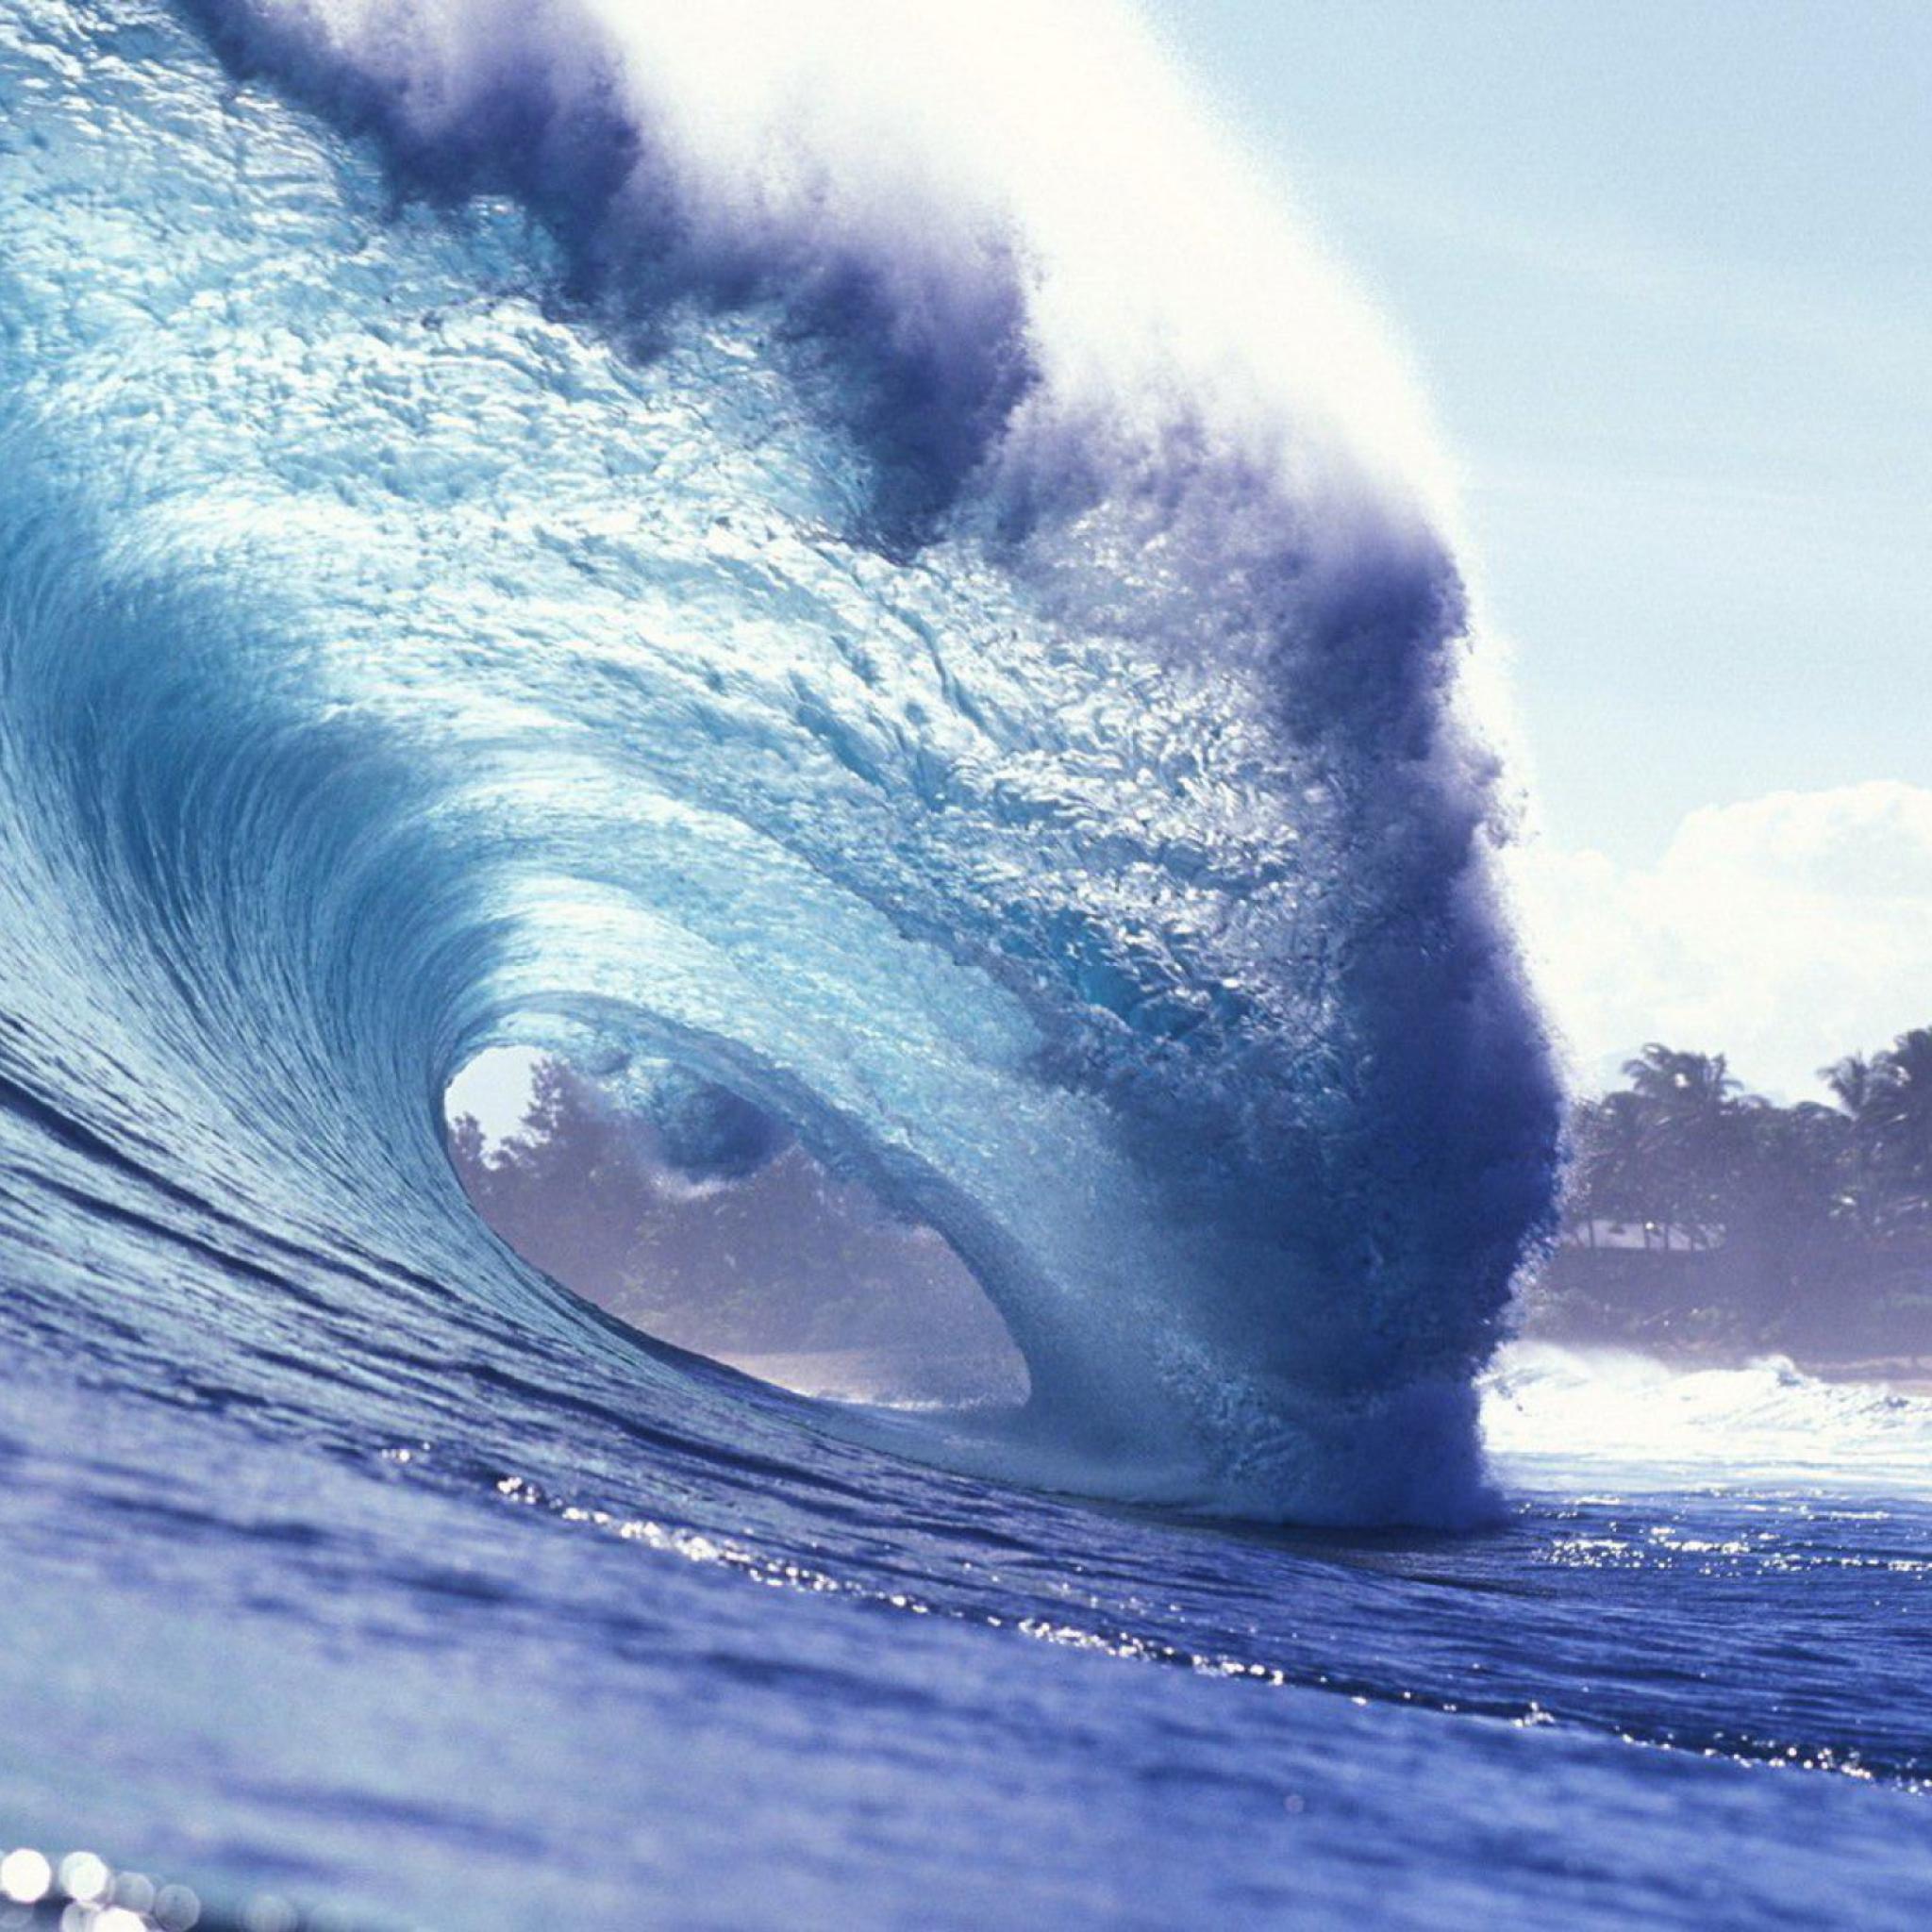 природа море волна вода  № 1195747 загрузить